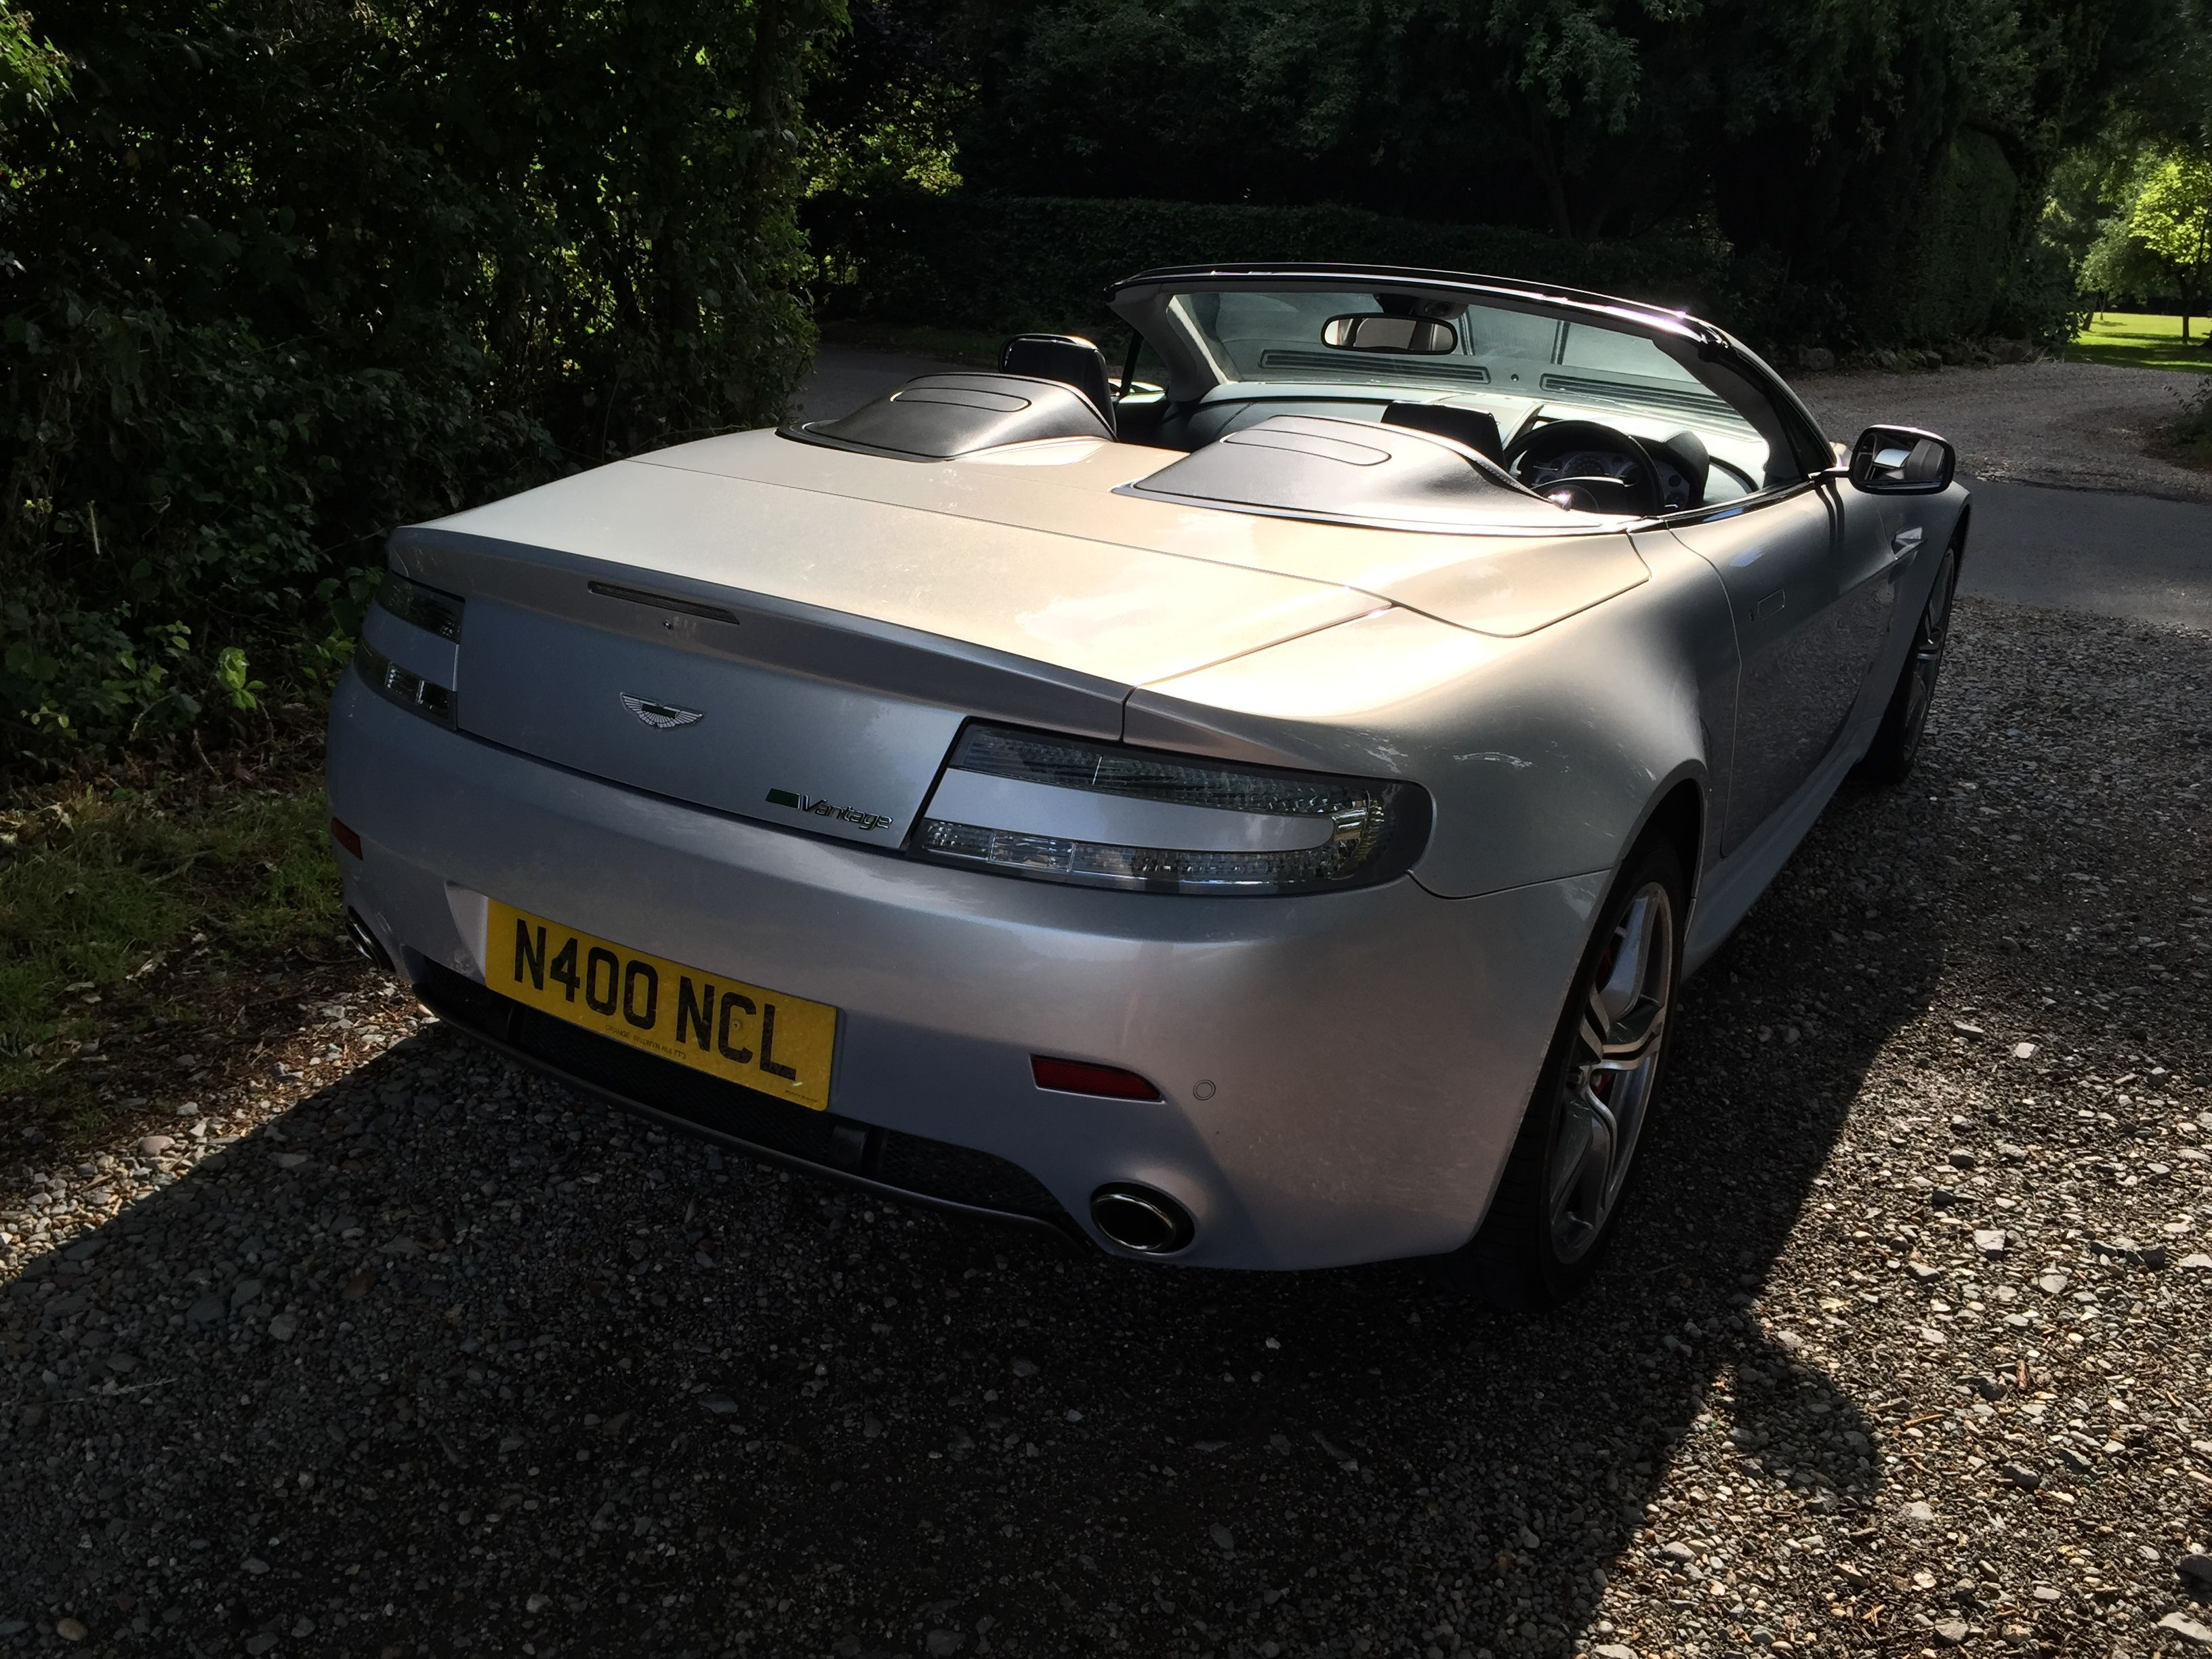 Pin By Keegan Drage On Aston Martin V8 Vantage N400 Aston Martin